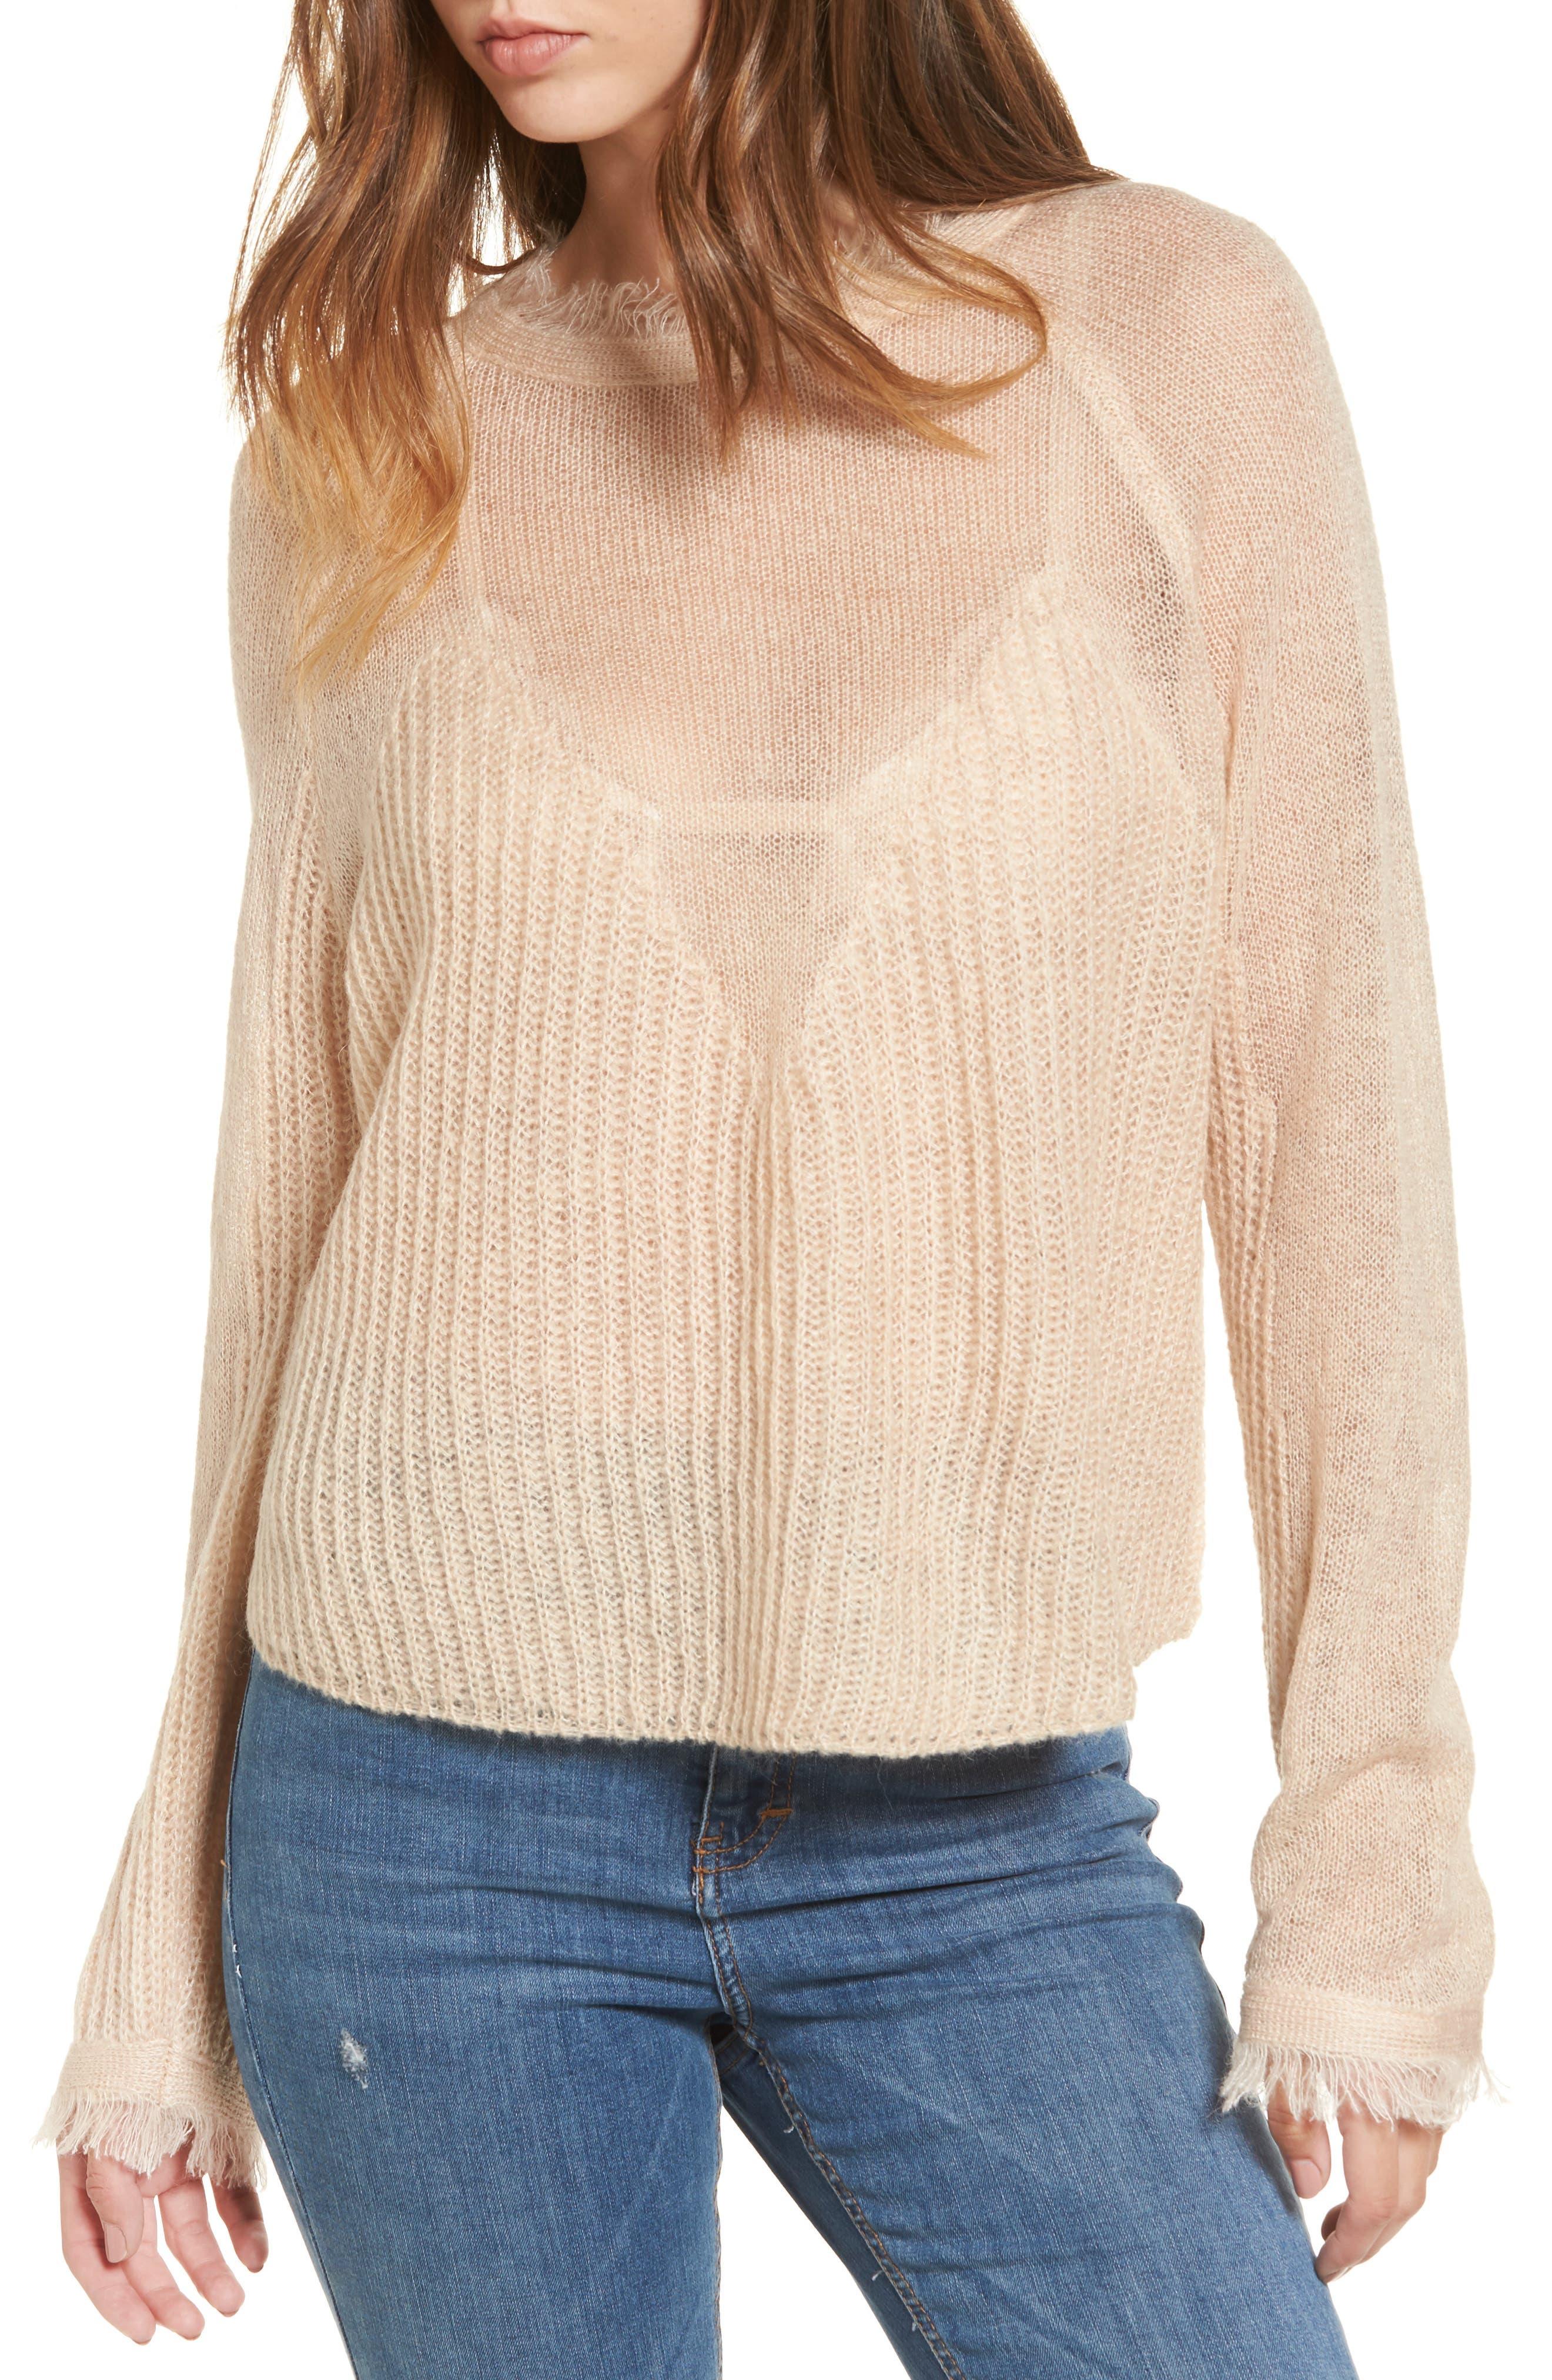 Moon River Sheer Knit Raglan Sweater